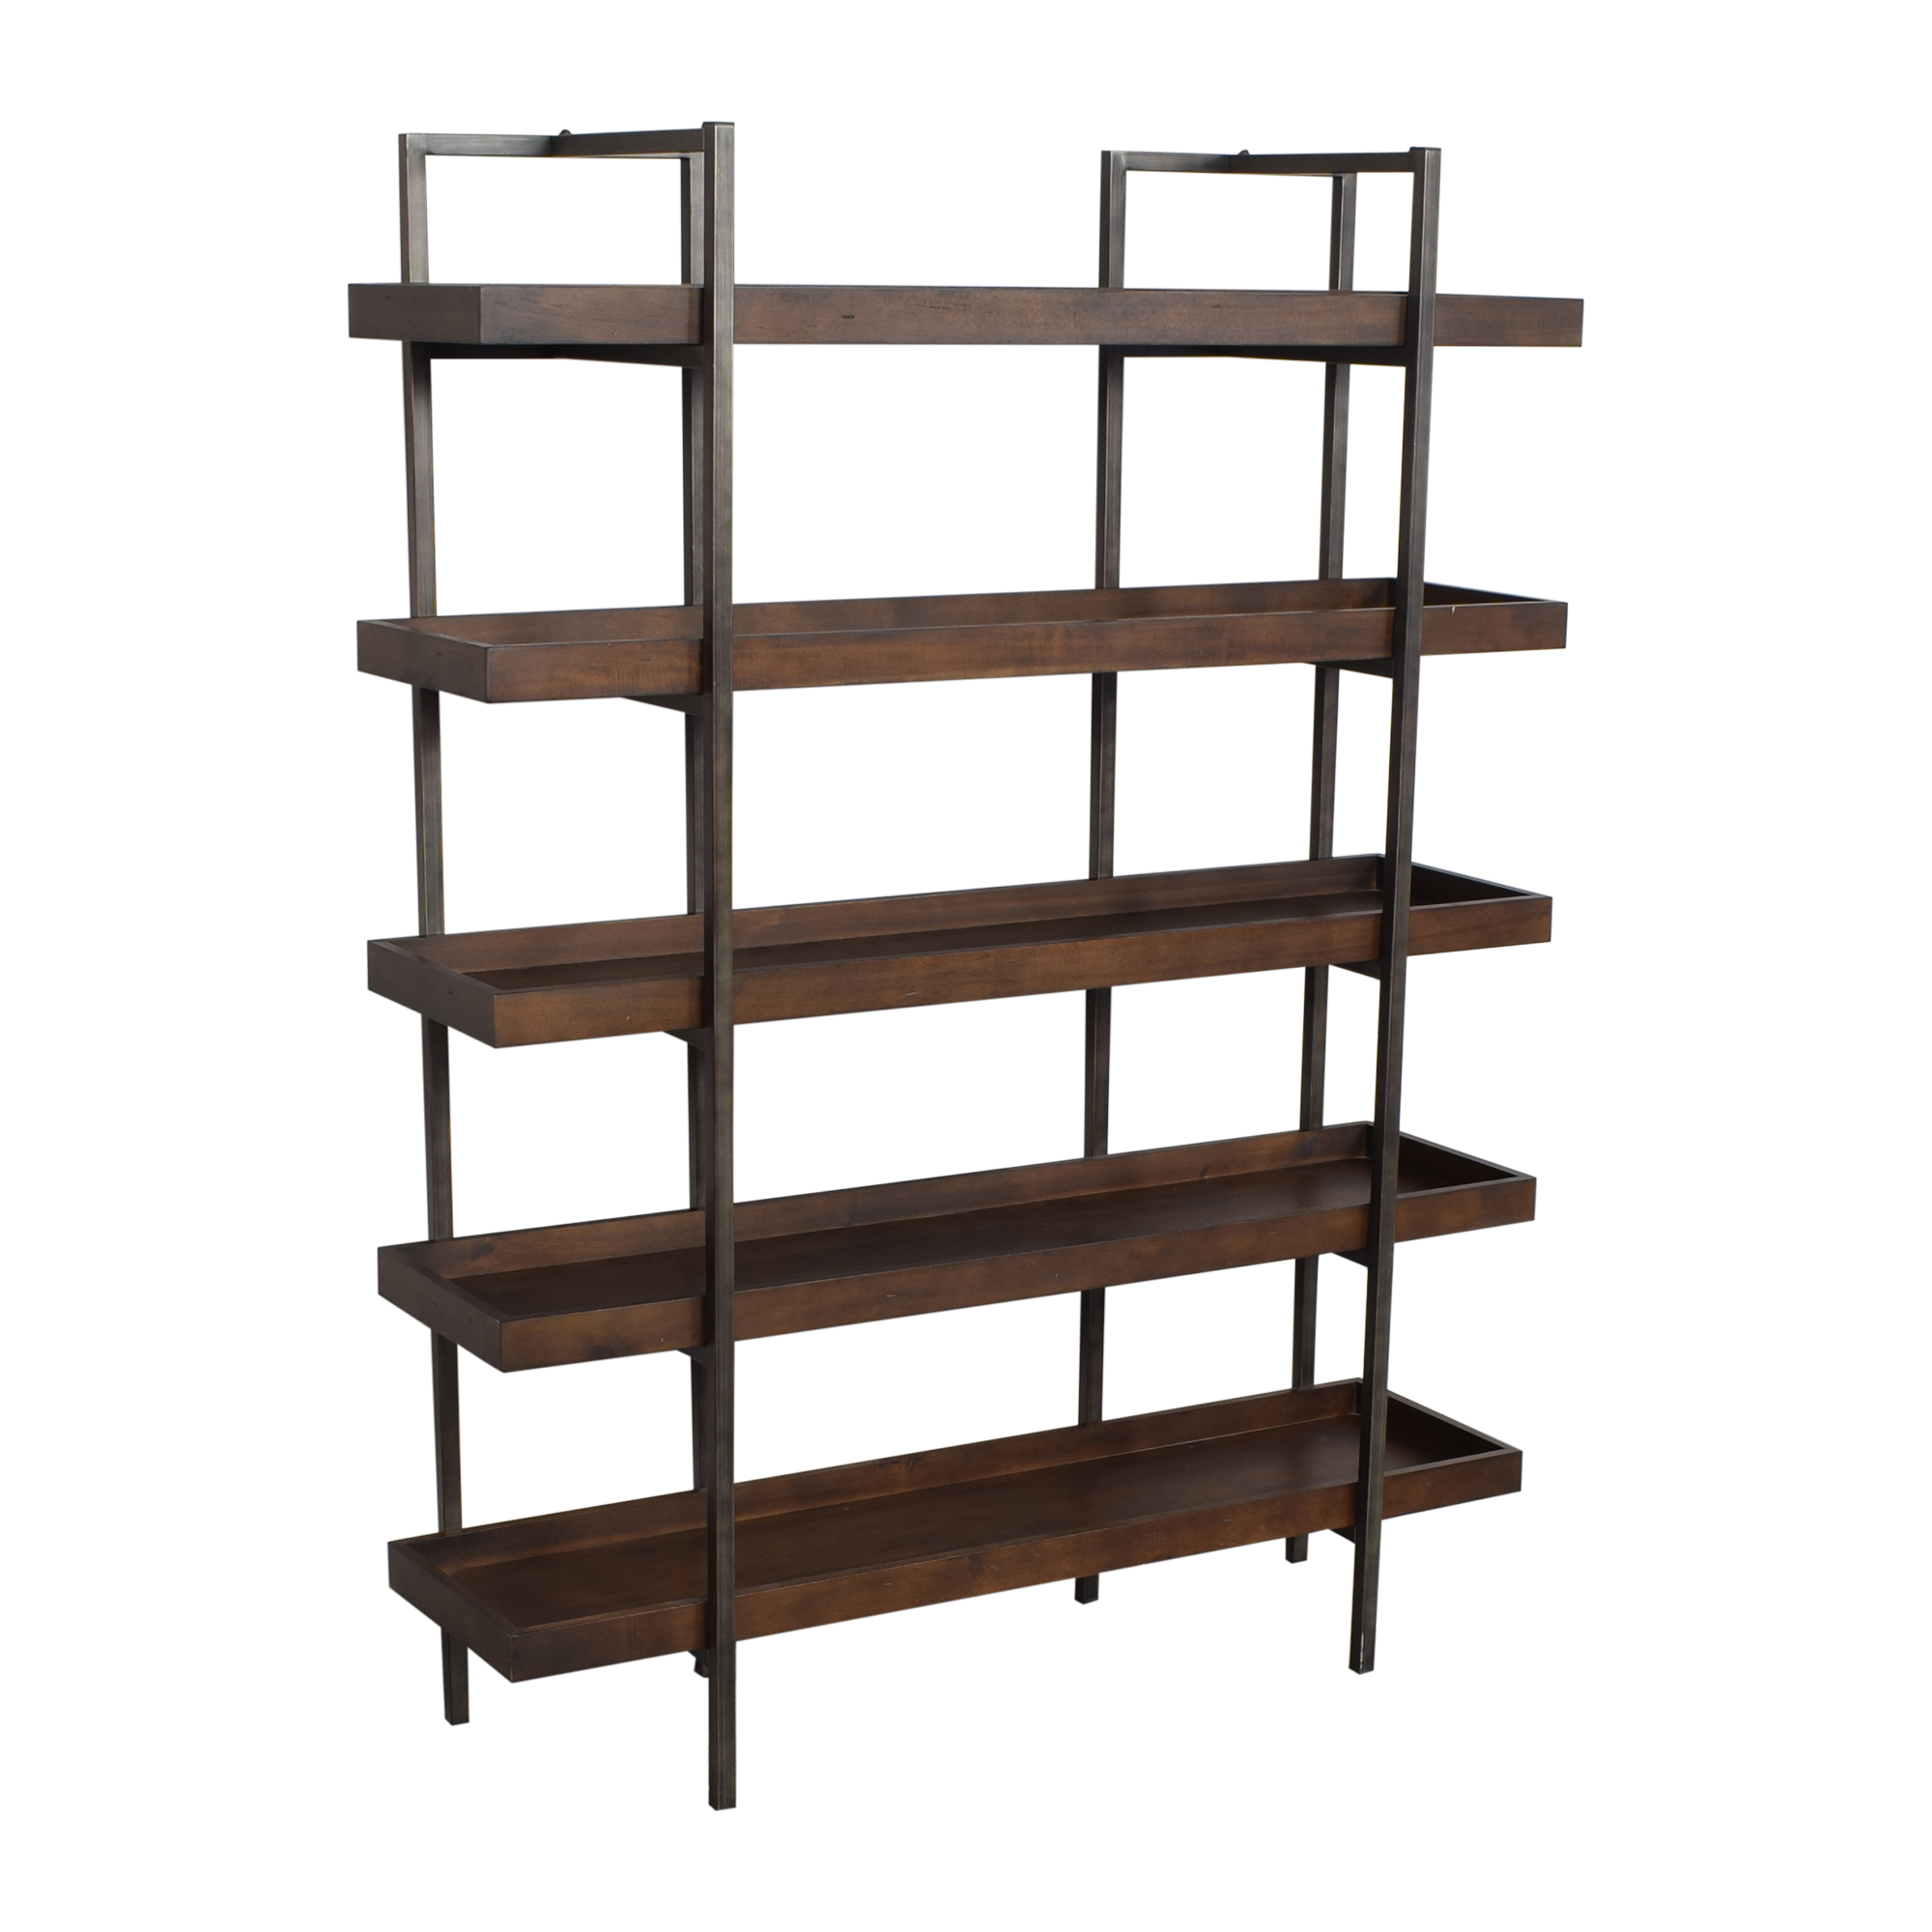 Ashley Furniture Ashley Furniture Starmore Bookcase nj